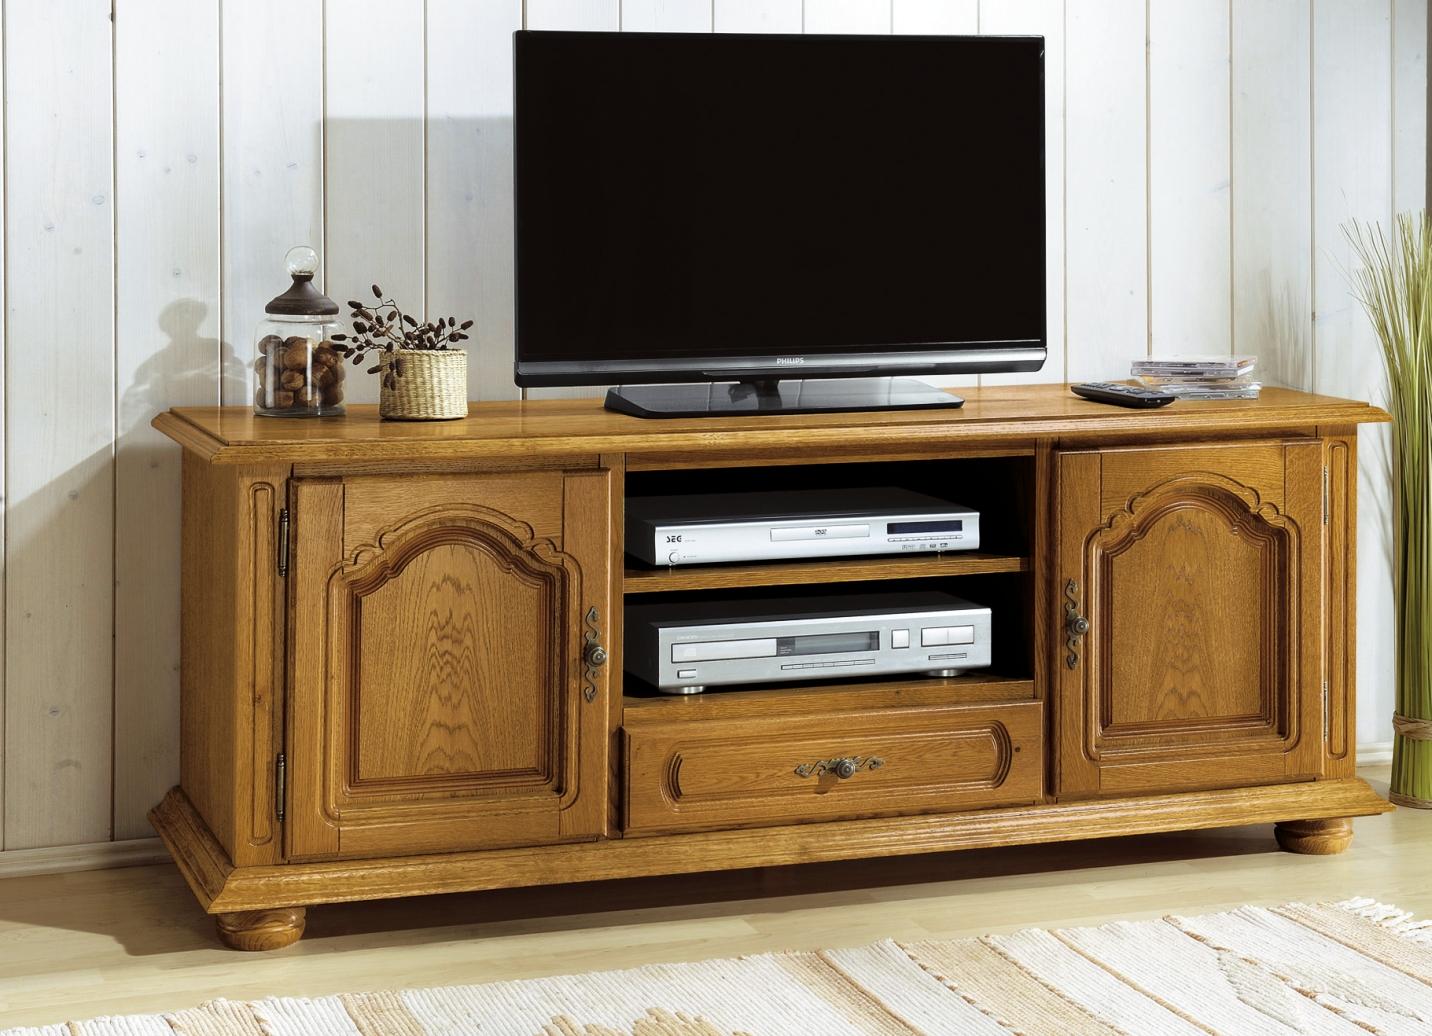 TV-Longboard in 2 Ausführungen - Hifi- & TV-Möbel Brigitte ...